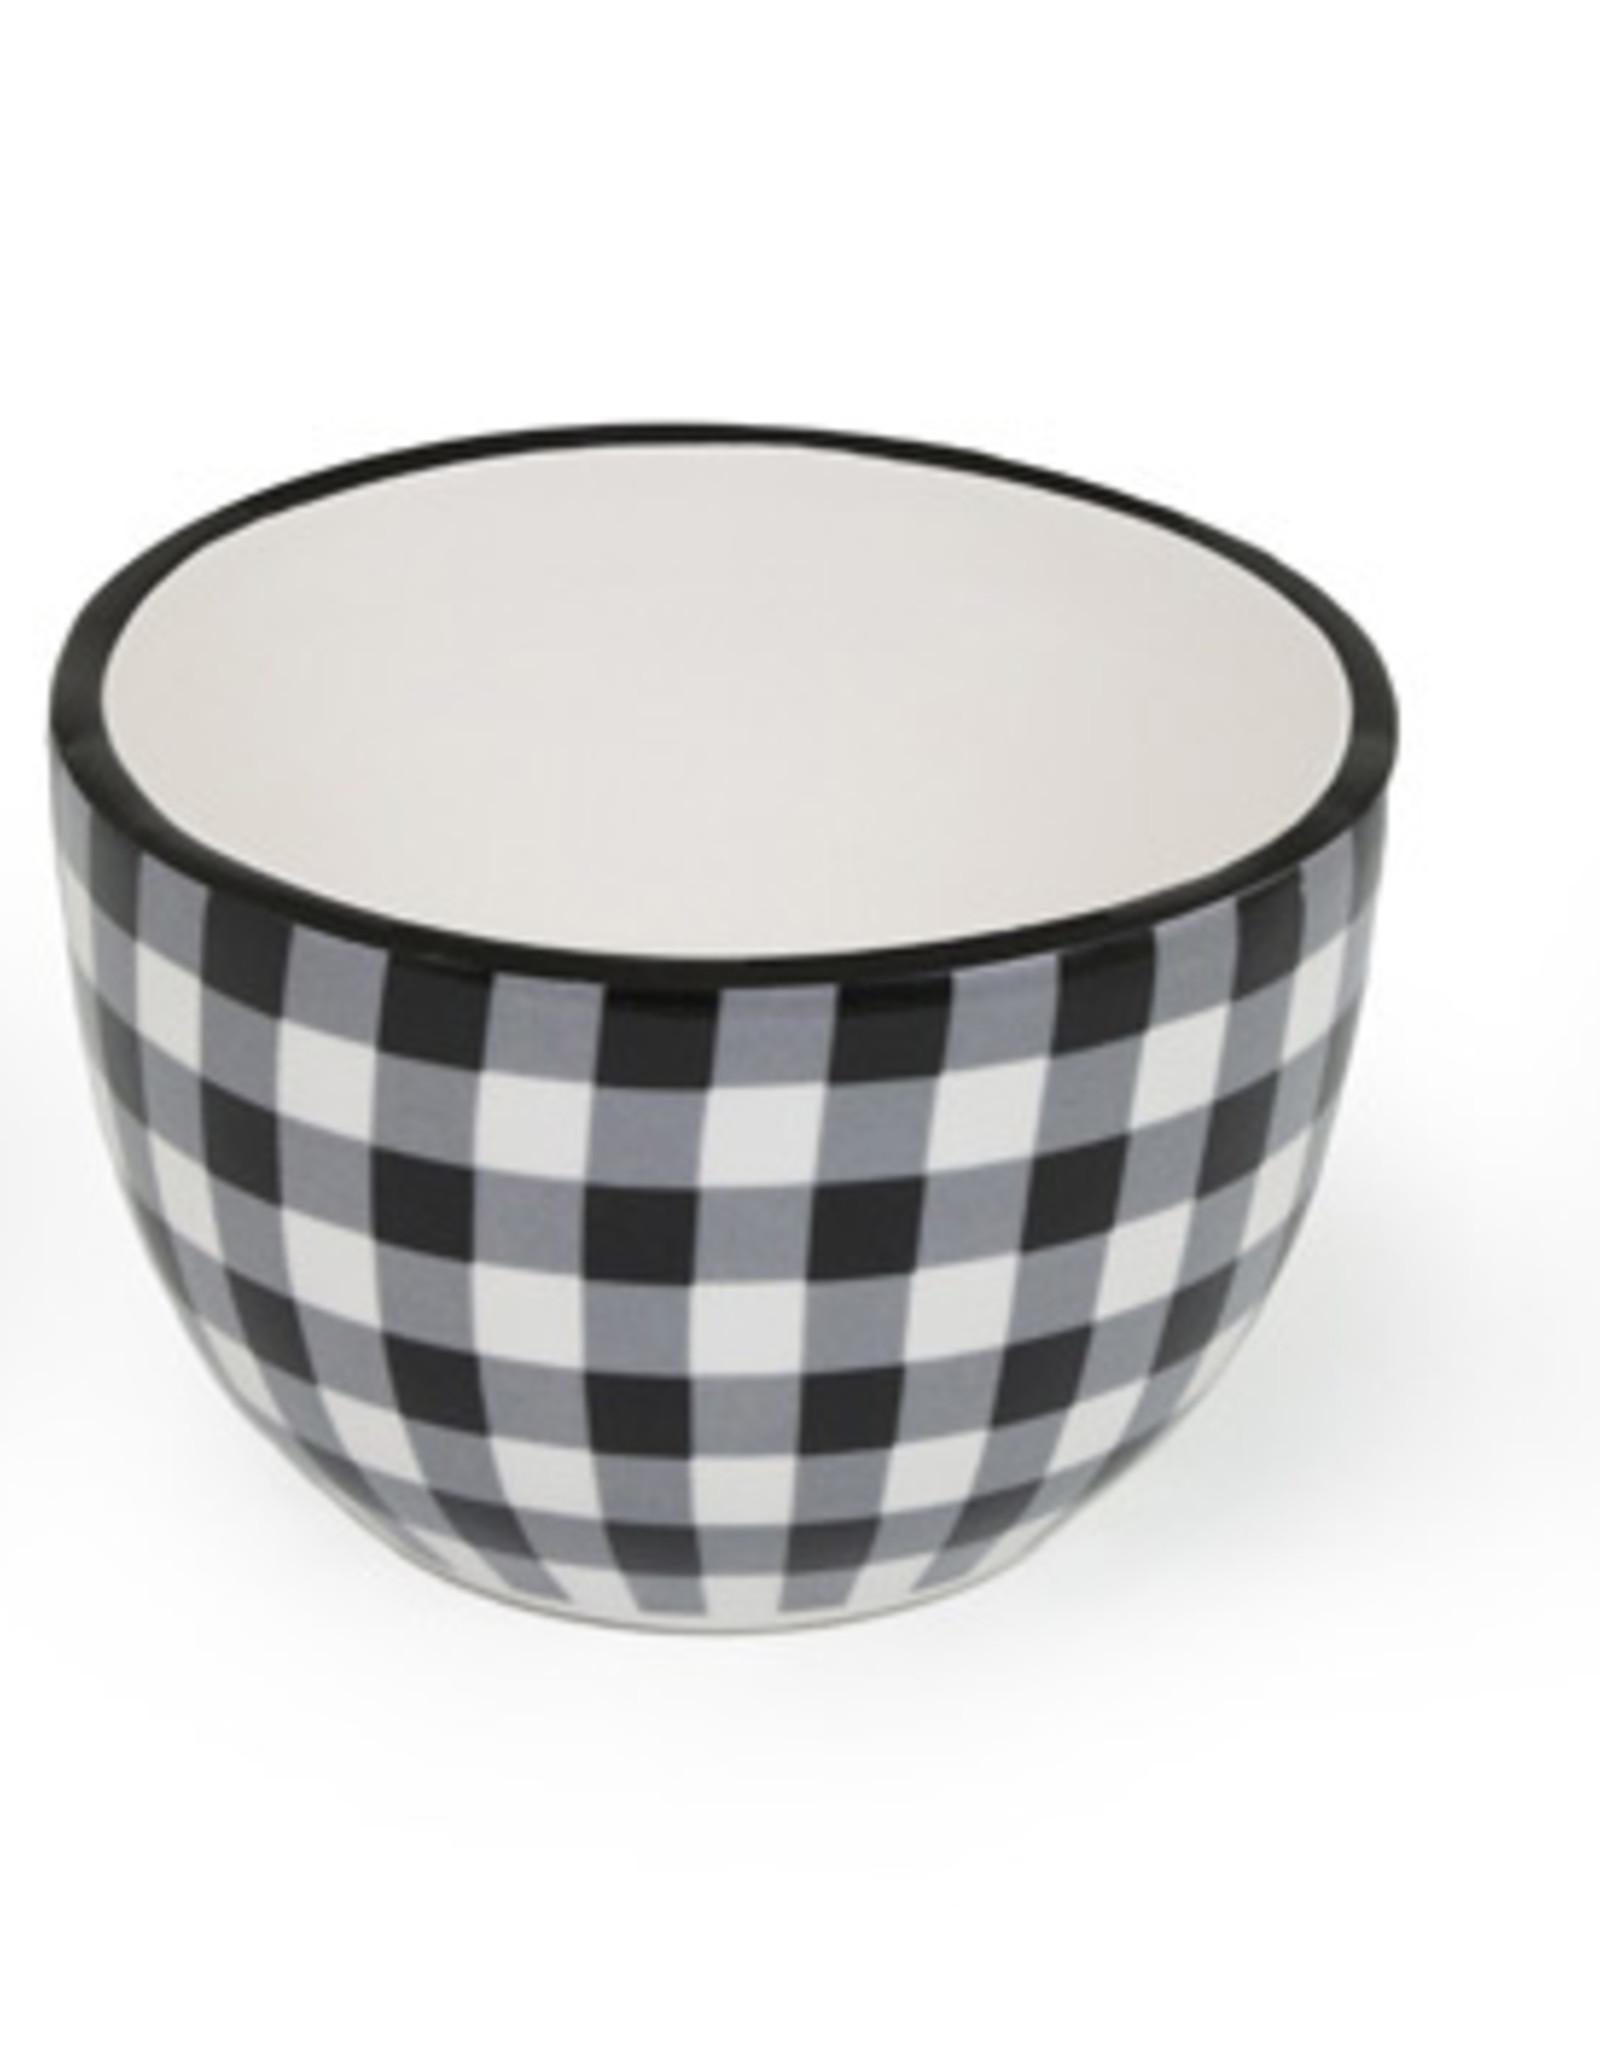 Boston International Bowls, Black & White Check, Set of 3